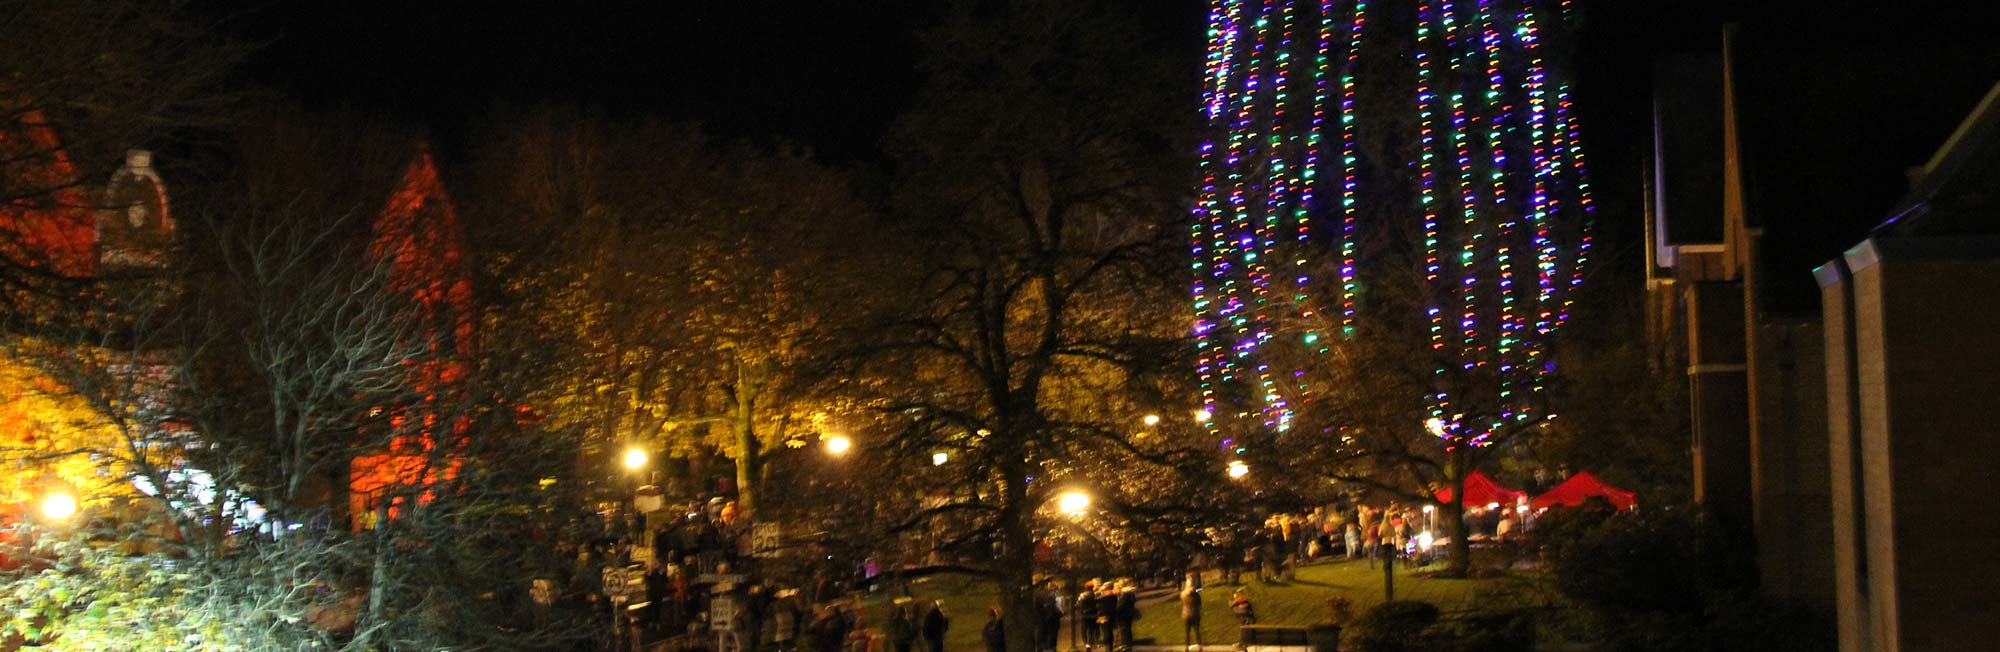 Annual Holiday Tree Lighting 2018